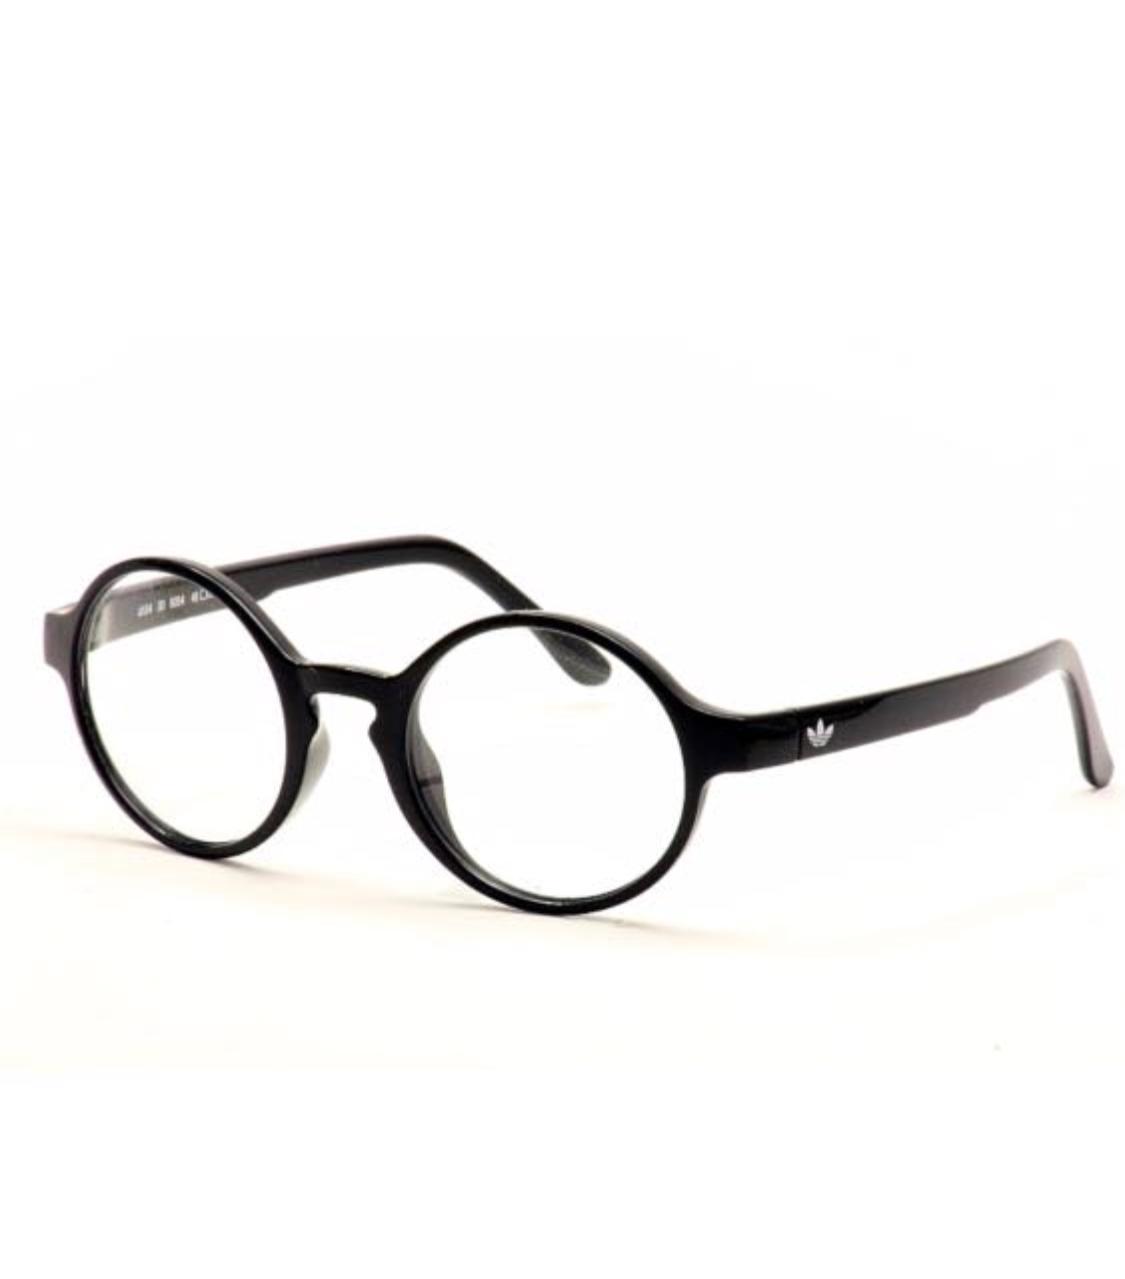 Latest Adidas Eyewear Glasses Products | Enjoy Huge Discounts ...